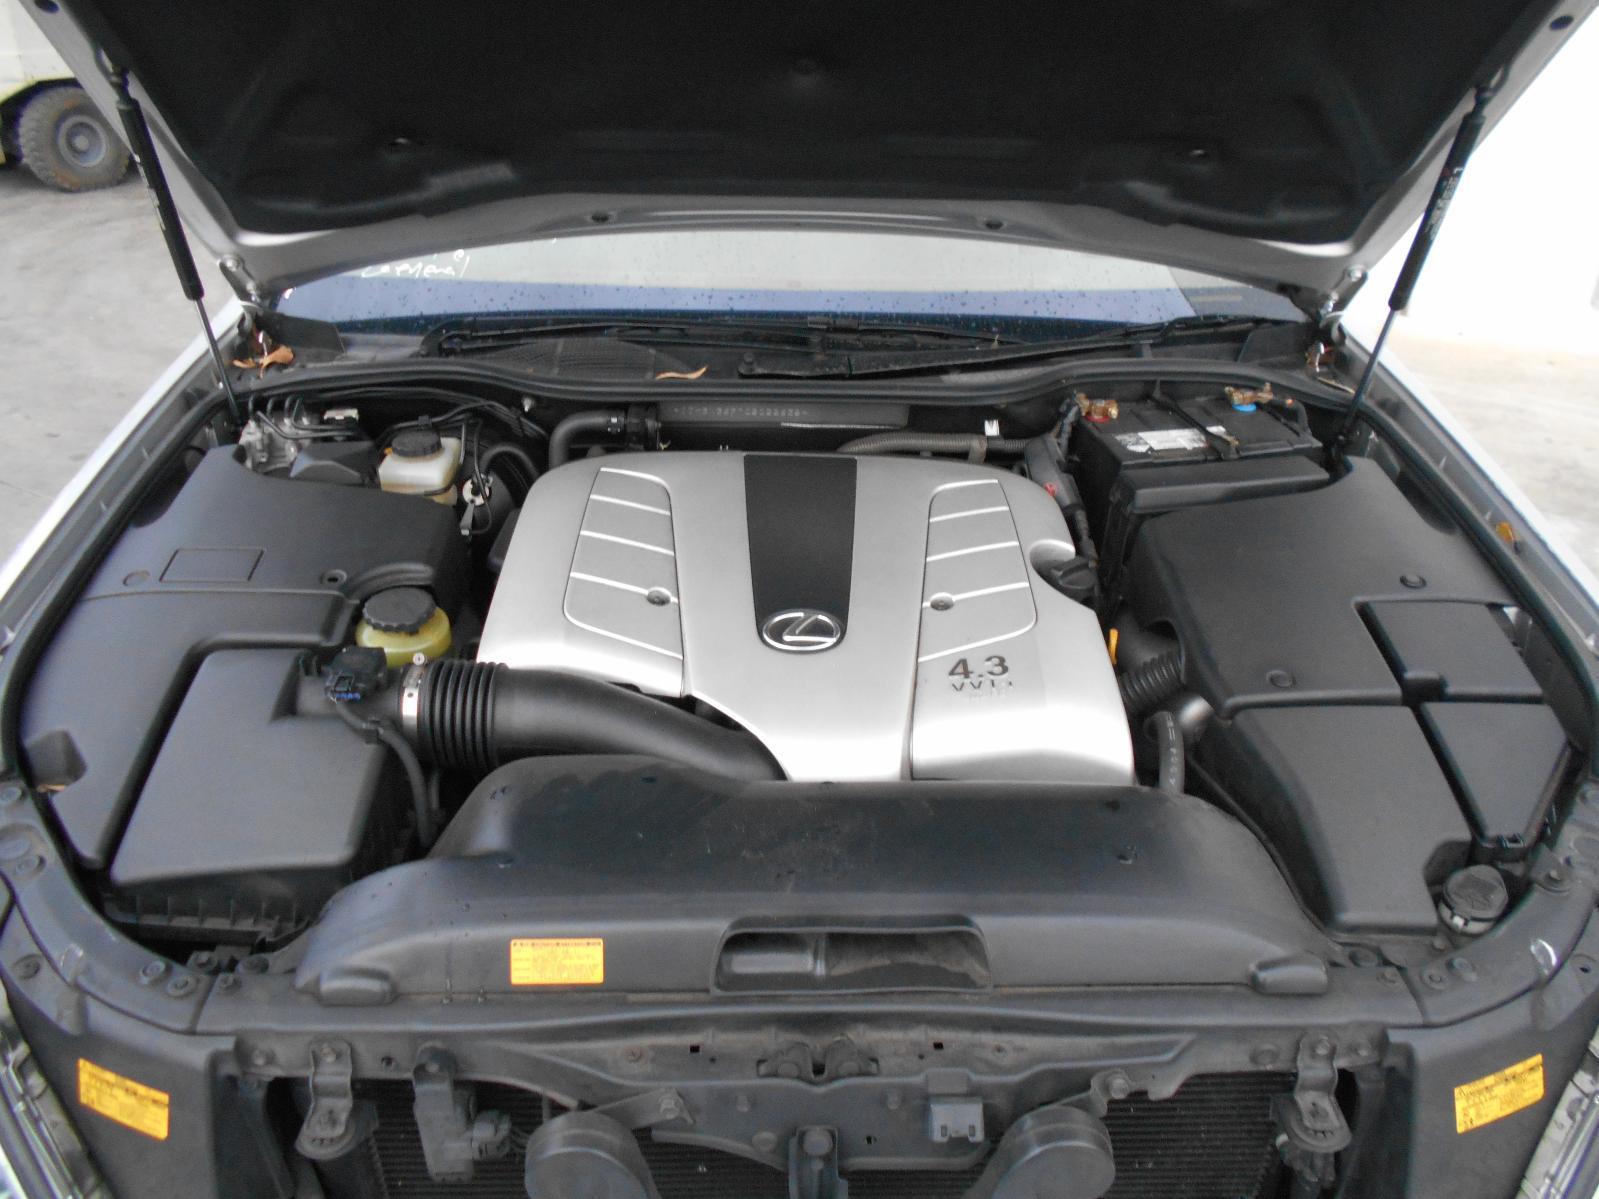 LEXUS LS430, Engine, 4.3, 3UZ, UCF30R, 12/00-03/07